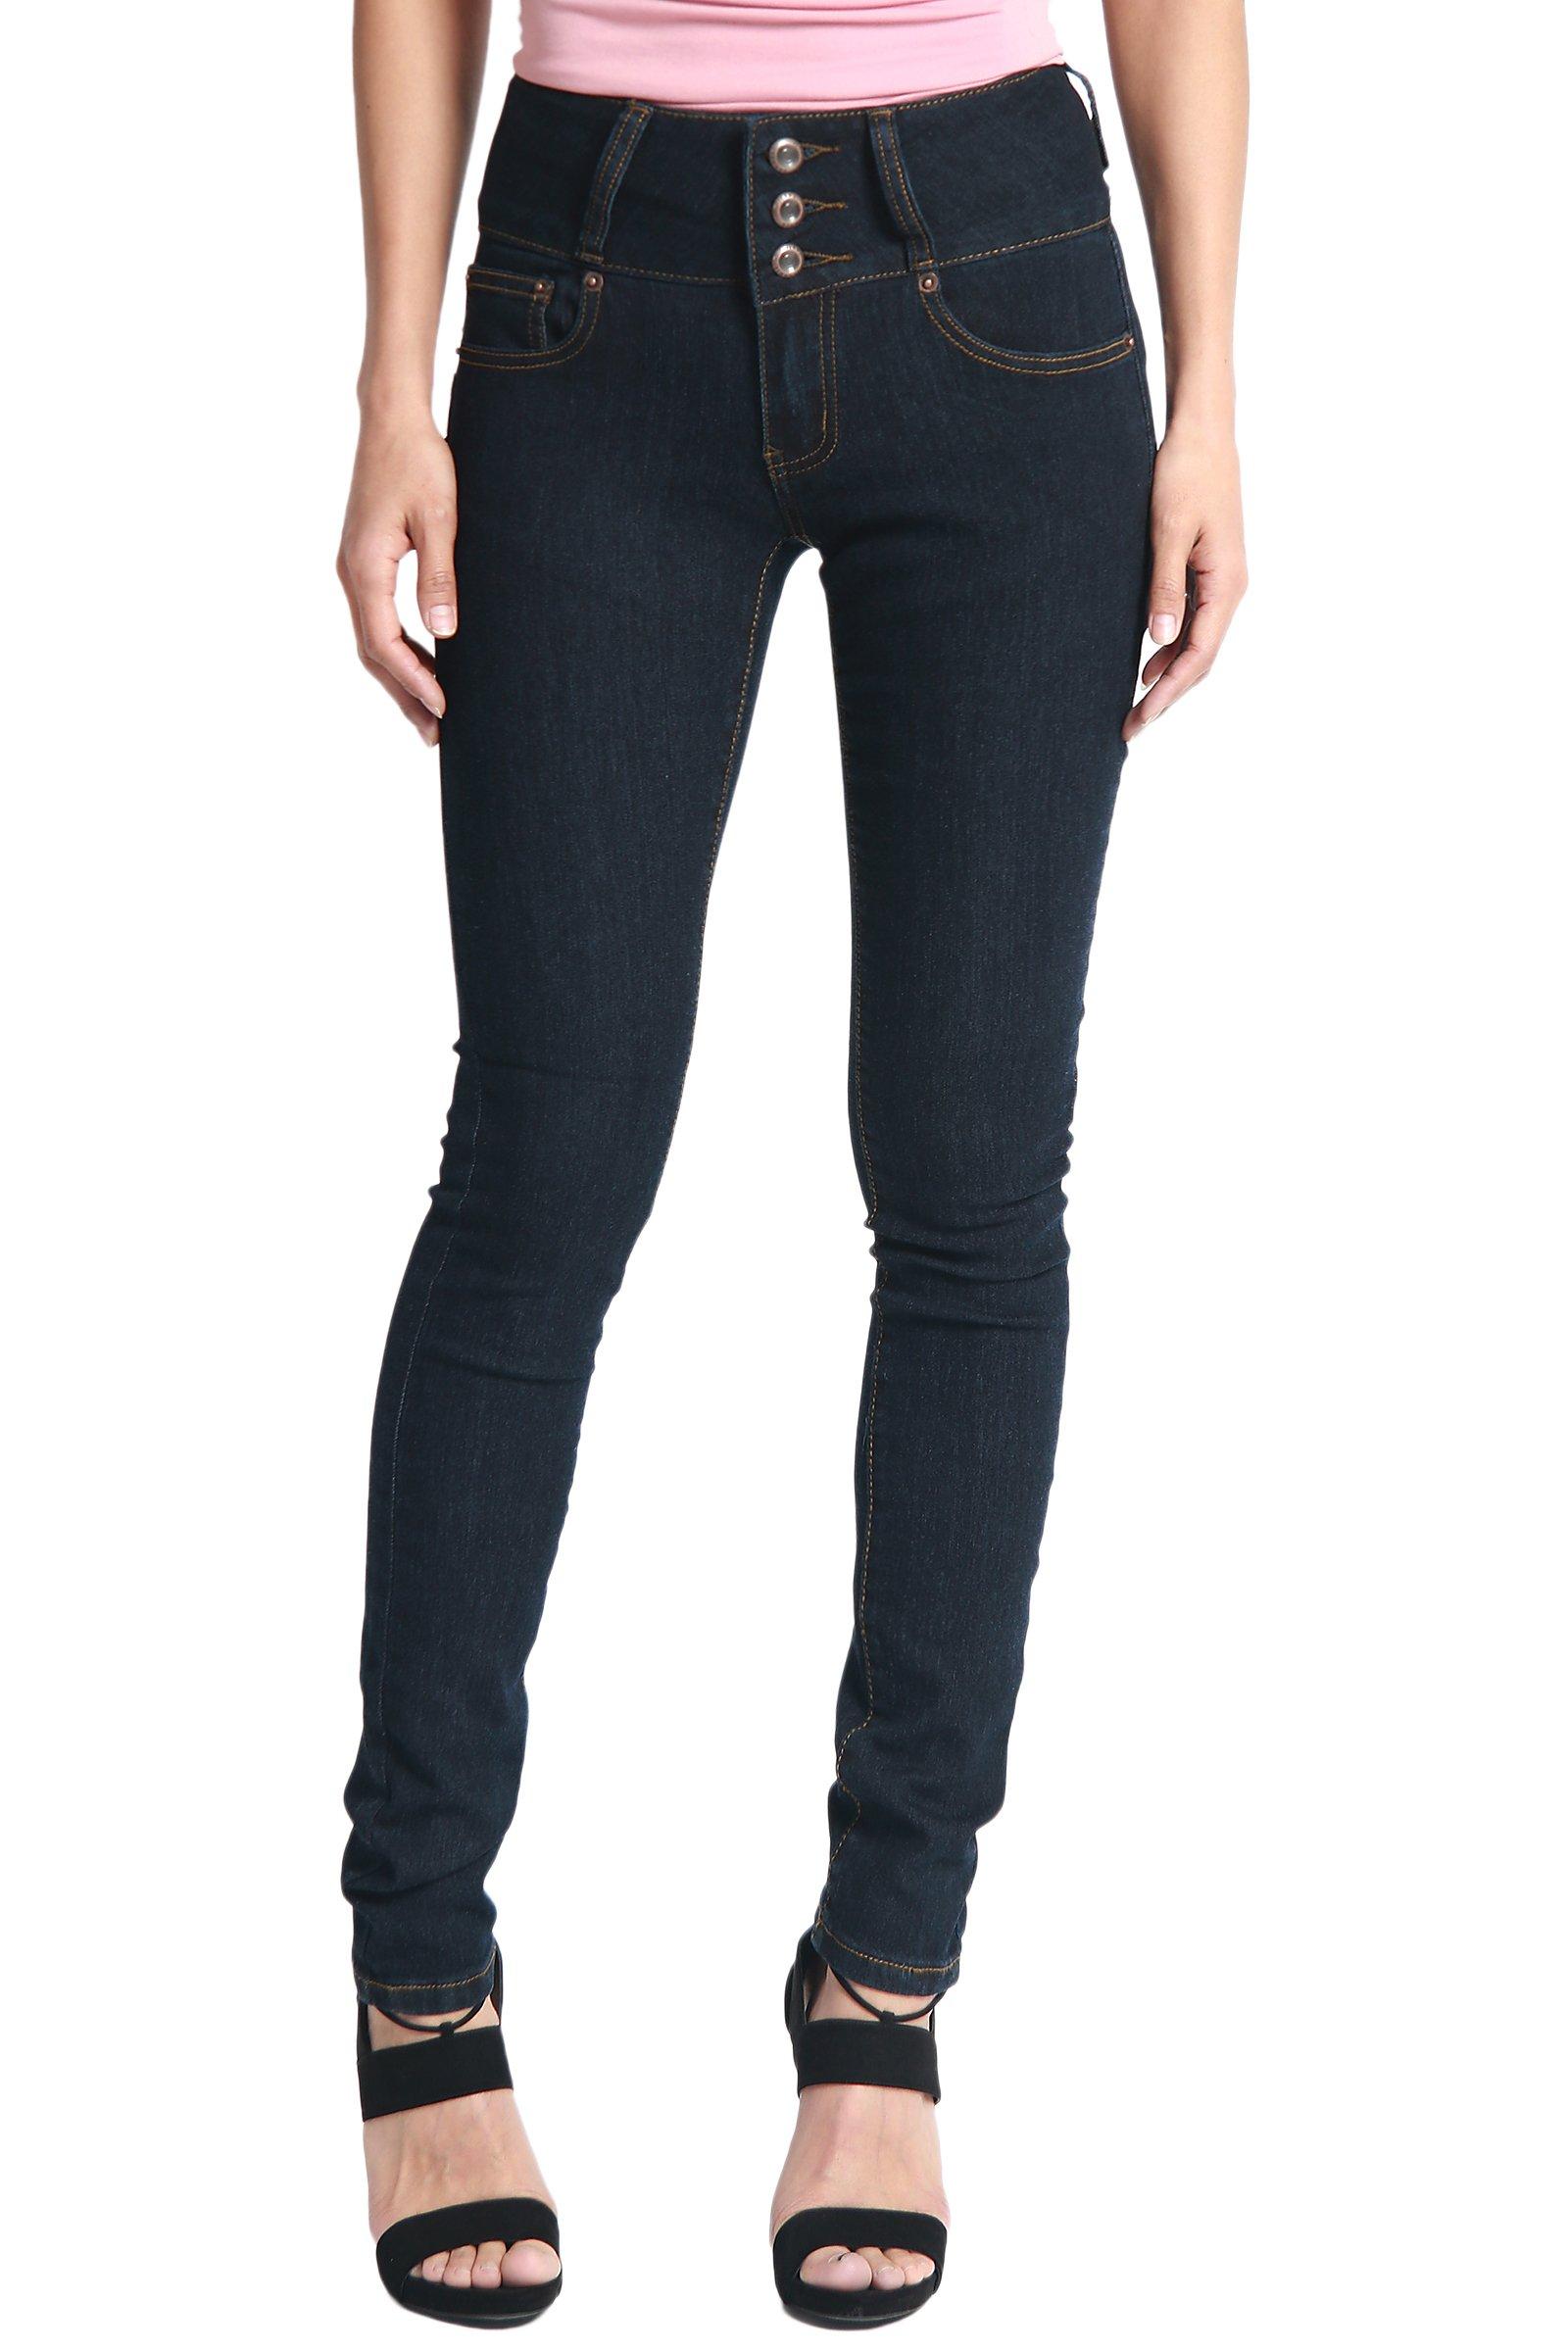 TheMogan Women's Hip up Butt Lifting High Waist Denim Skinny Jeans Super Dark 7